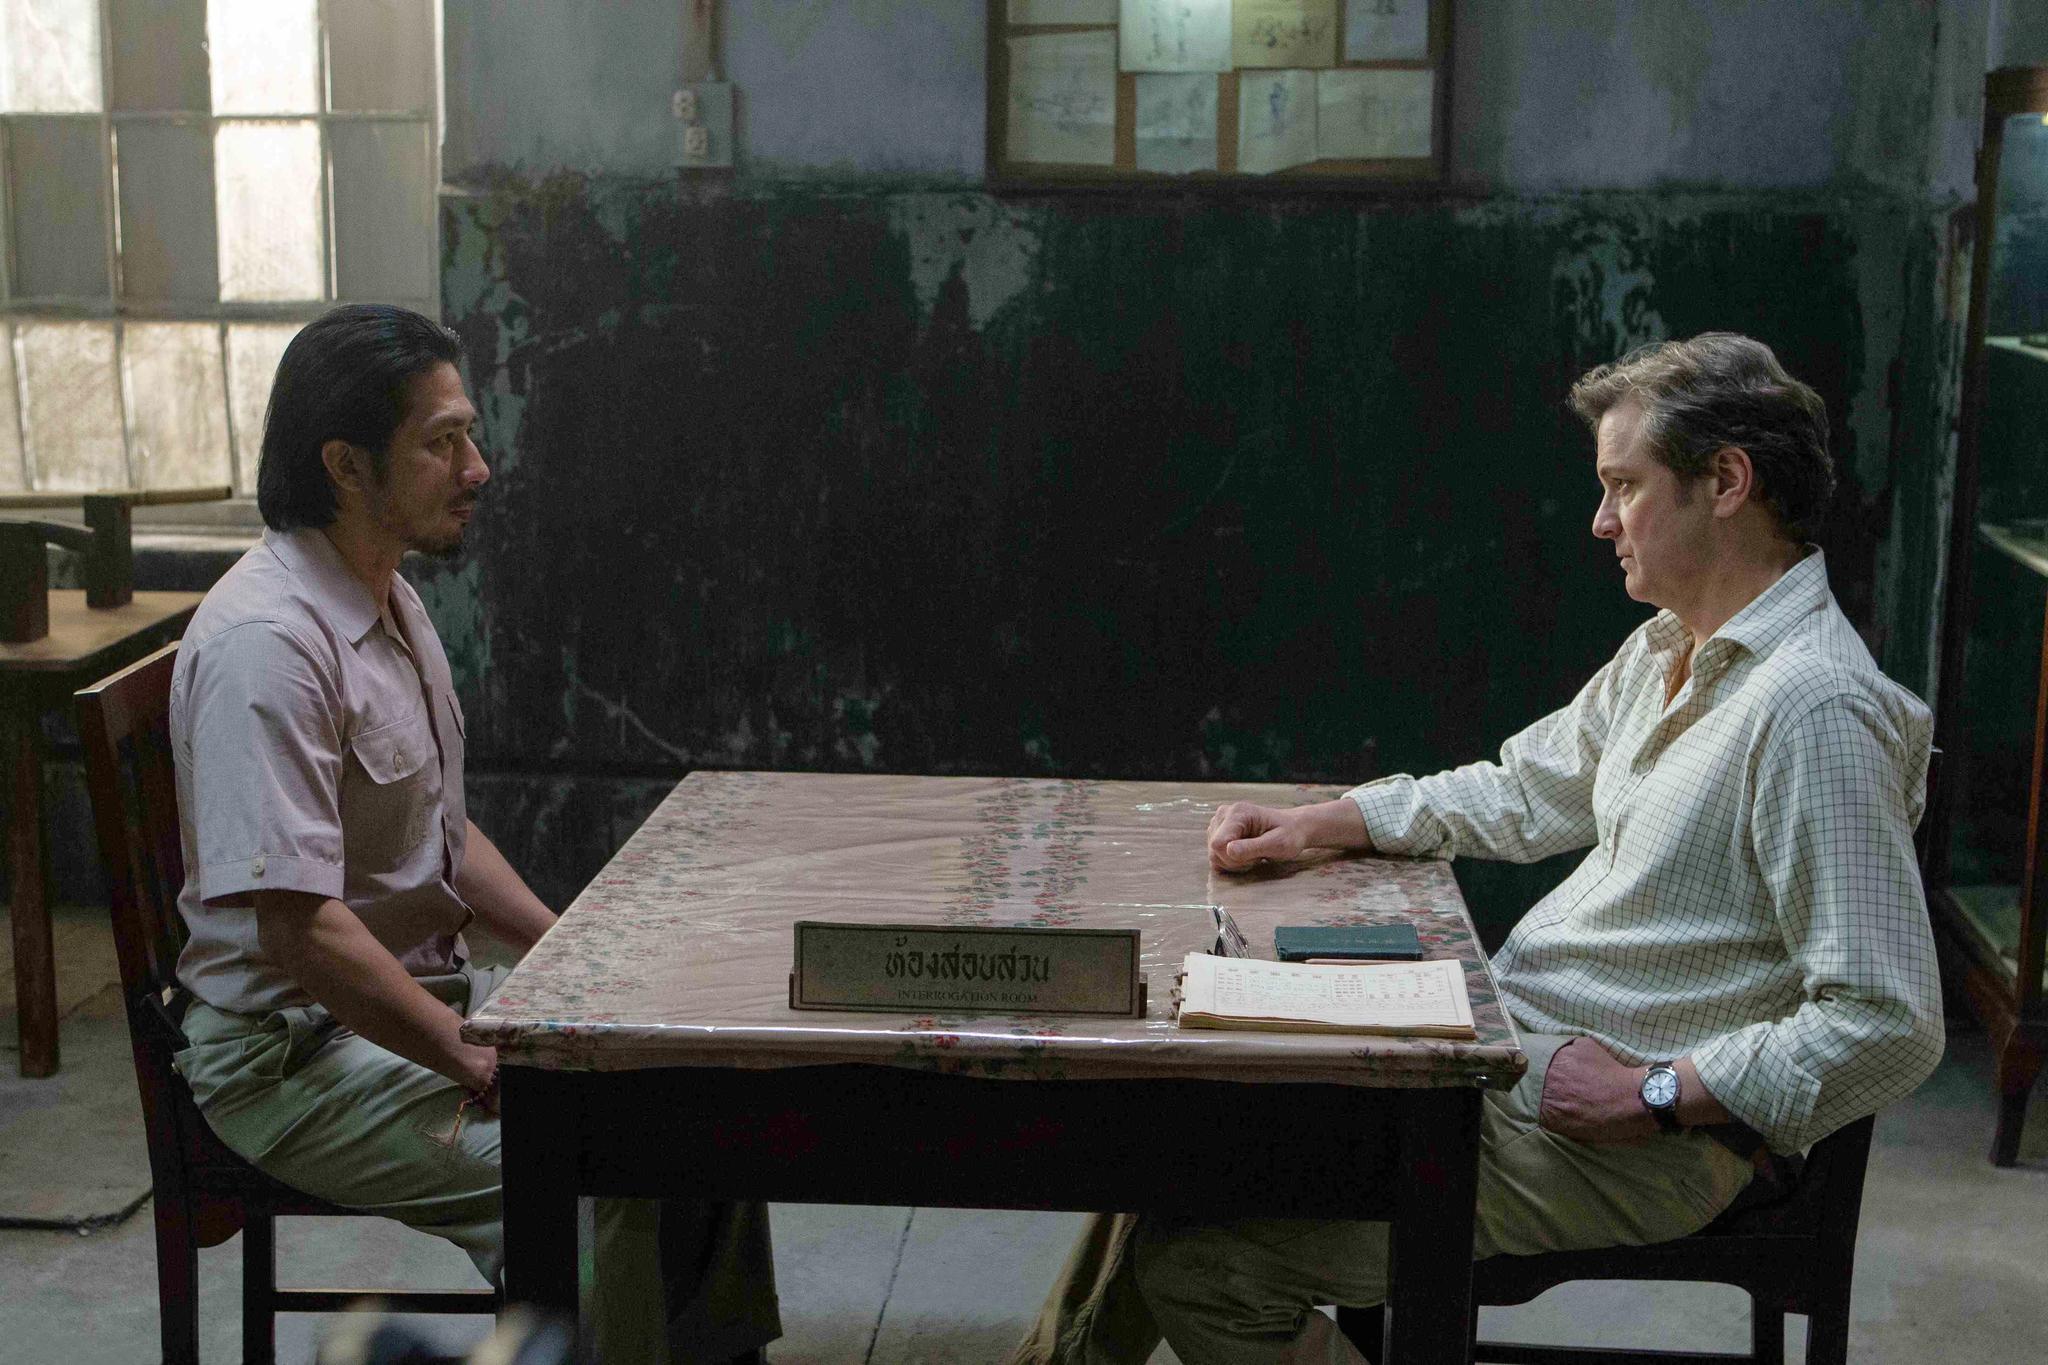 Colin Firth and Hiroyuki Sanada in The Railway Man (2013)